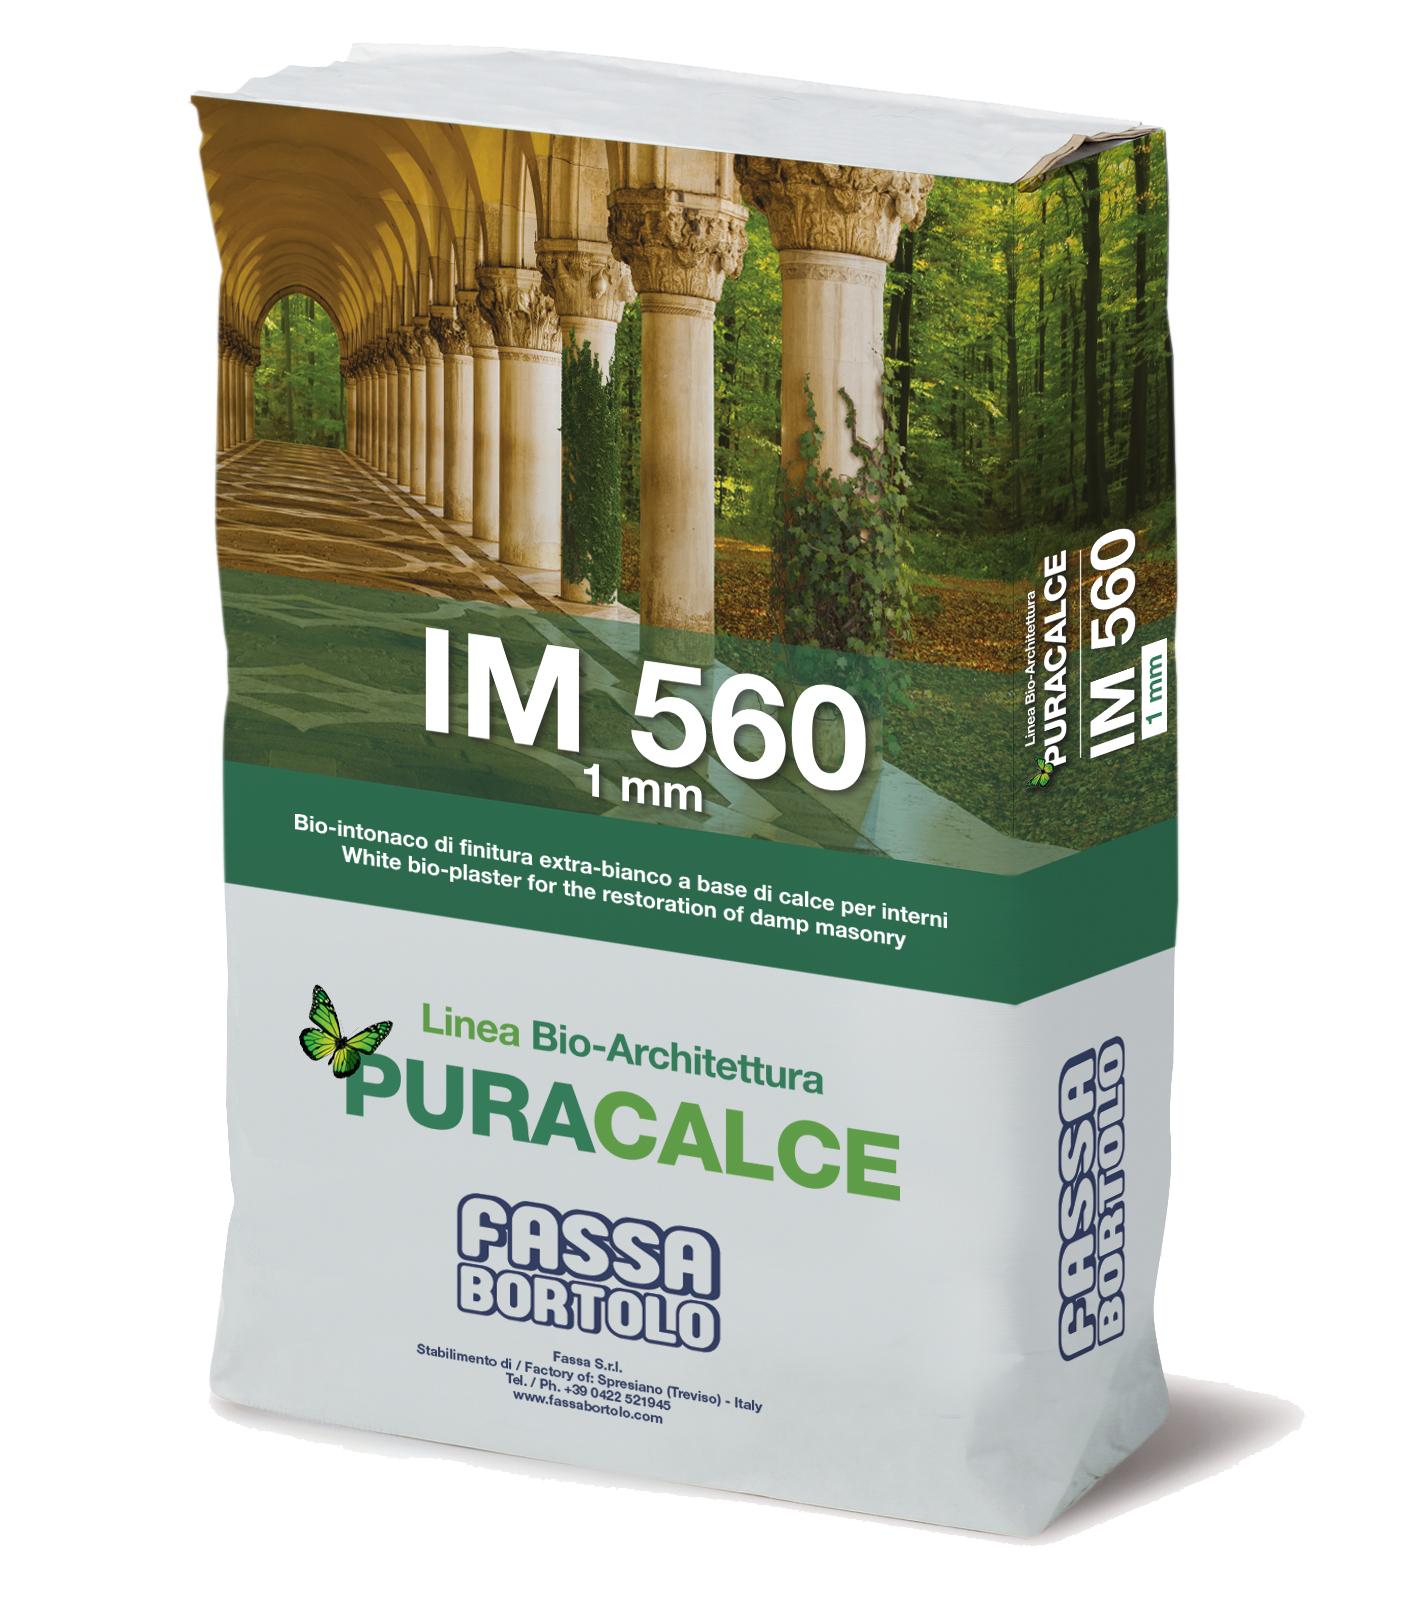 IM 560: Bio-intonaco di finitura a base di calce extra-bianco per interni